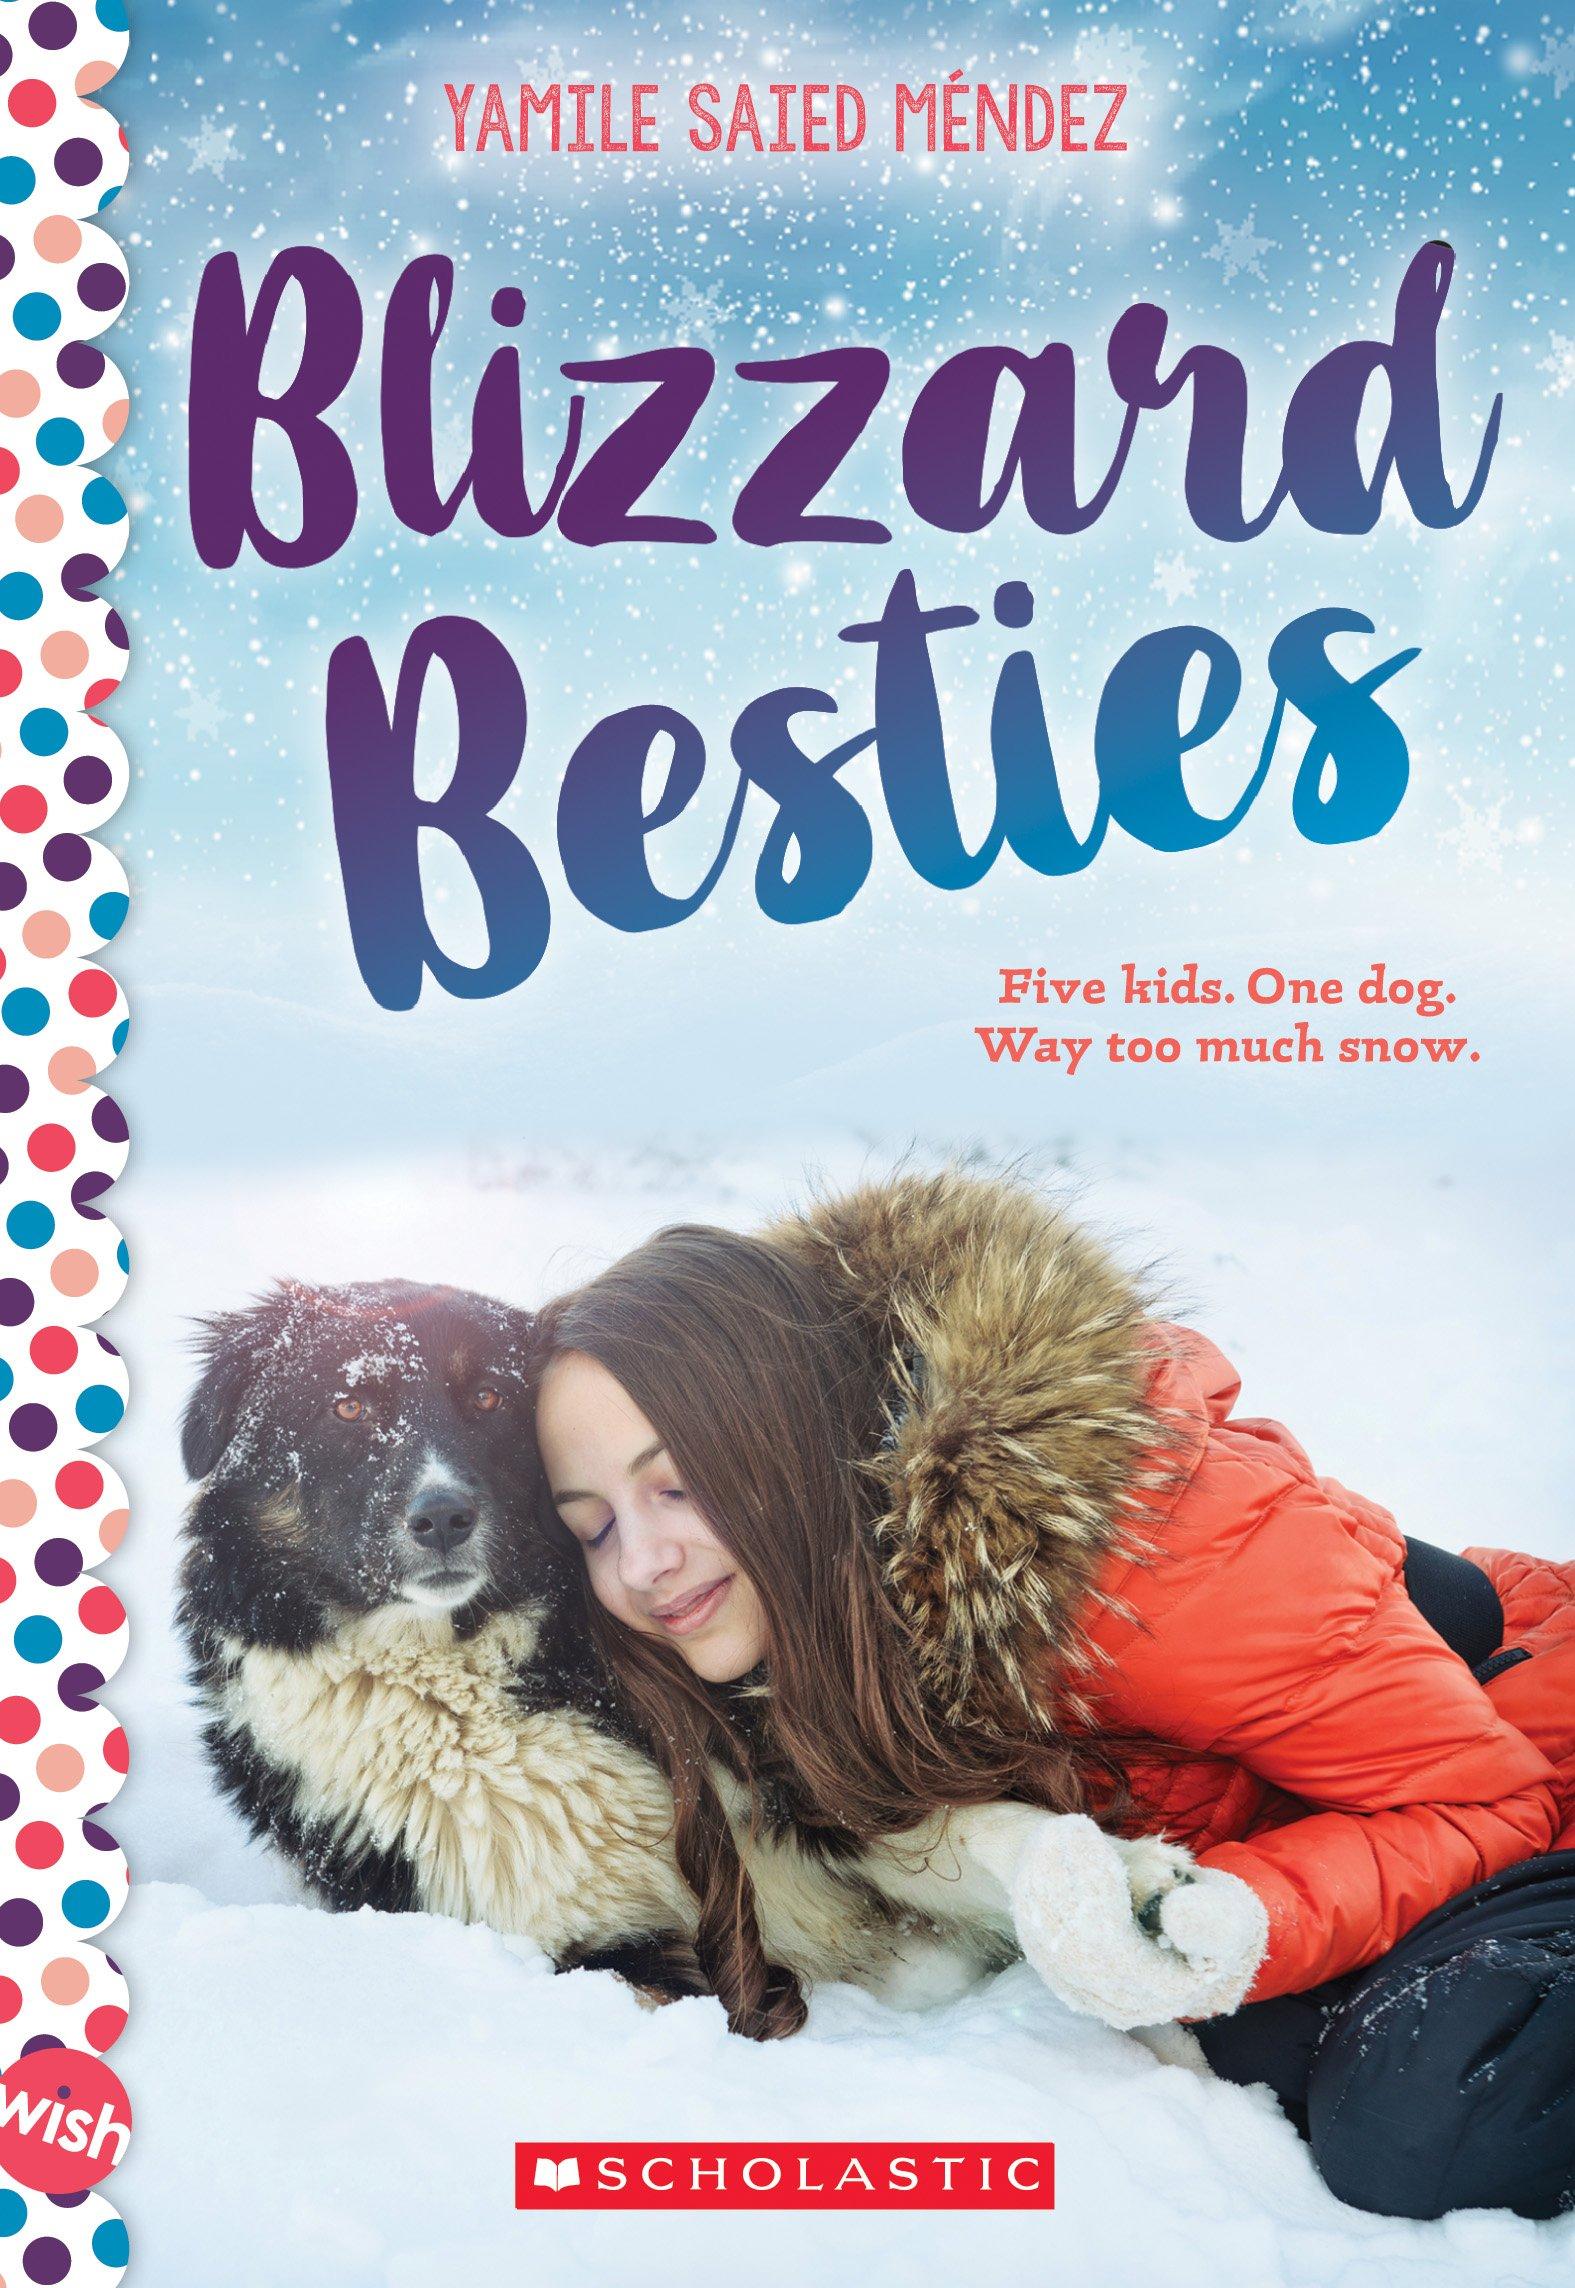 Blizzard Besties A Wish Novel Mendez Yamile Saied 9781338316391 Amazon Com Books